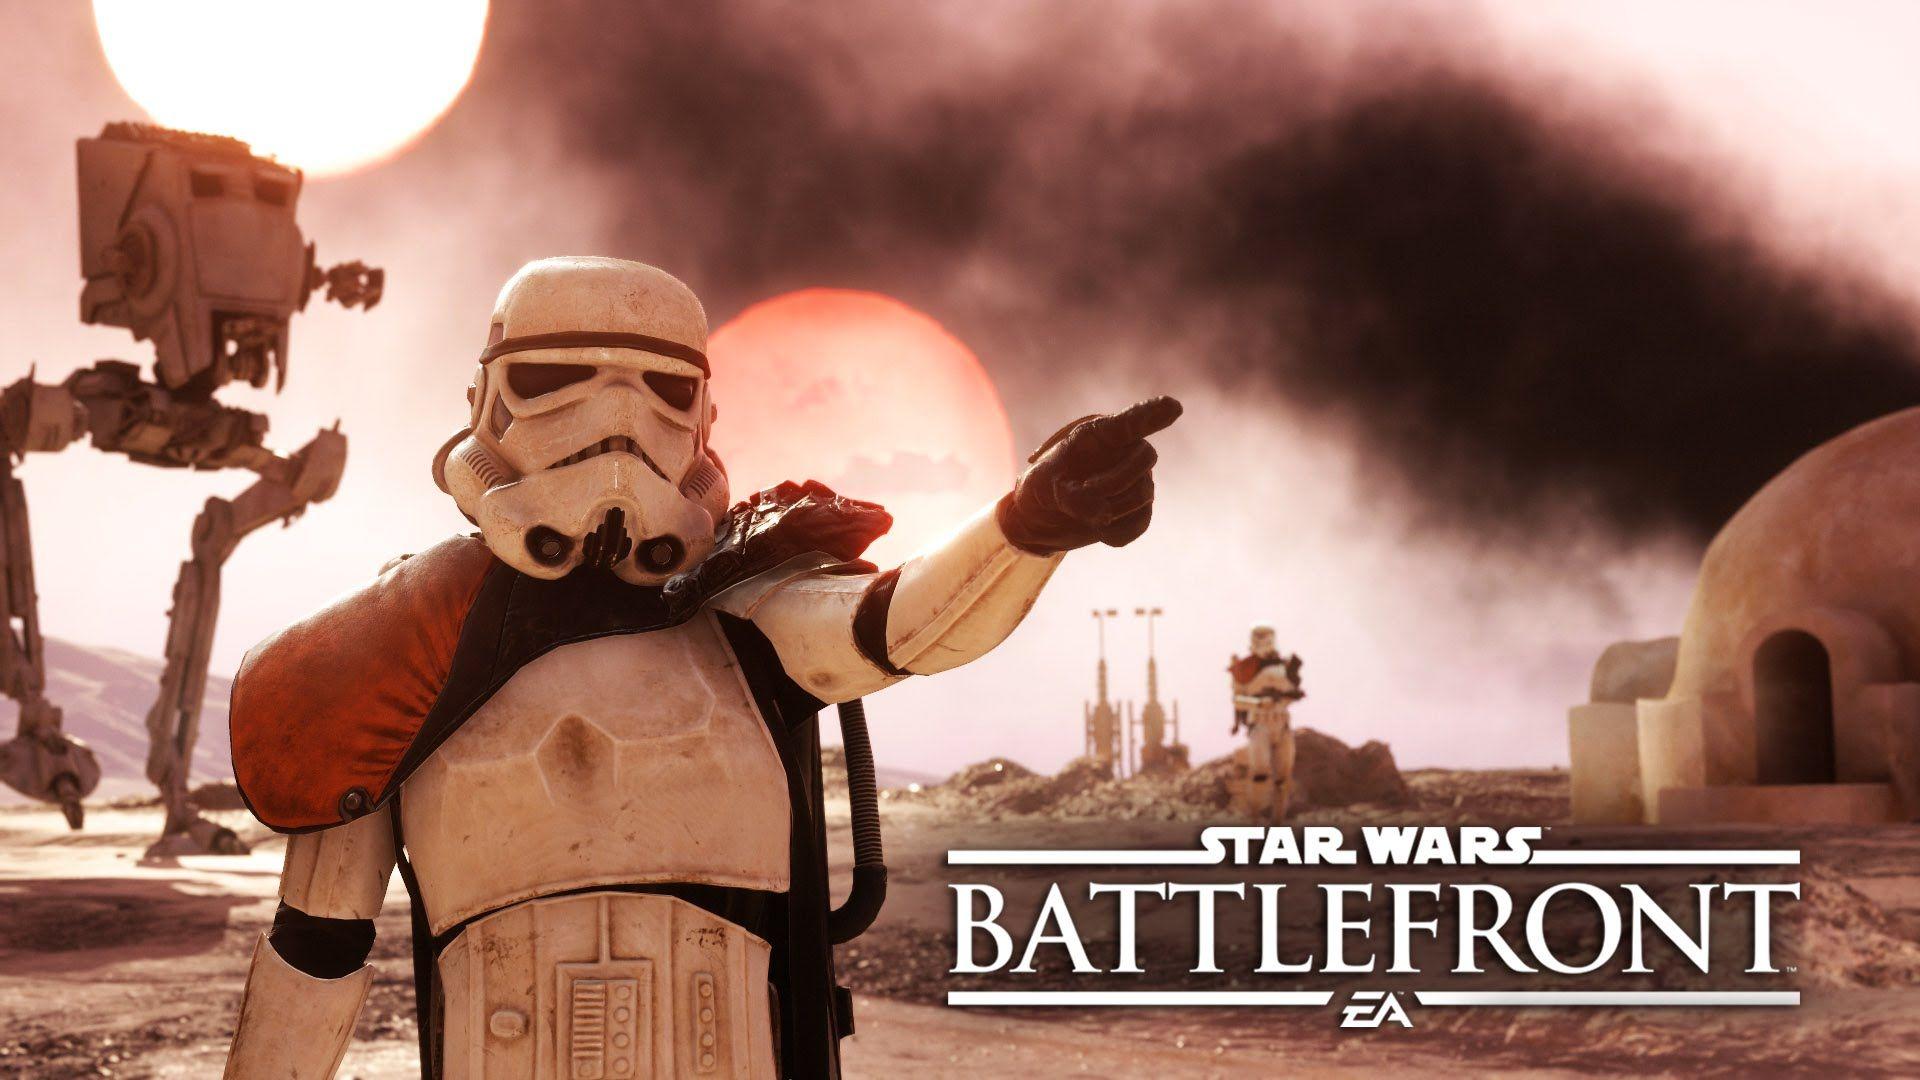 DLC de Star Wars Battlefront incluirán nuevos universos - http://yosoyungamer.com/2015/11/dlc-de-star-wars-battlefront-incluiran-nuevos-universos/